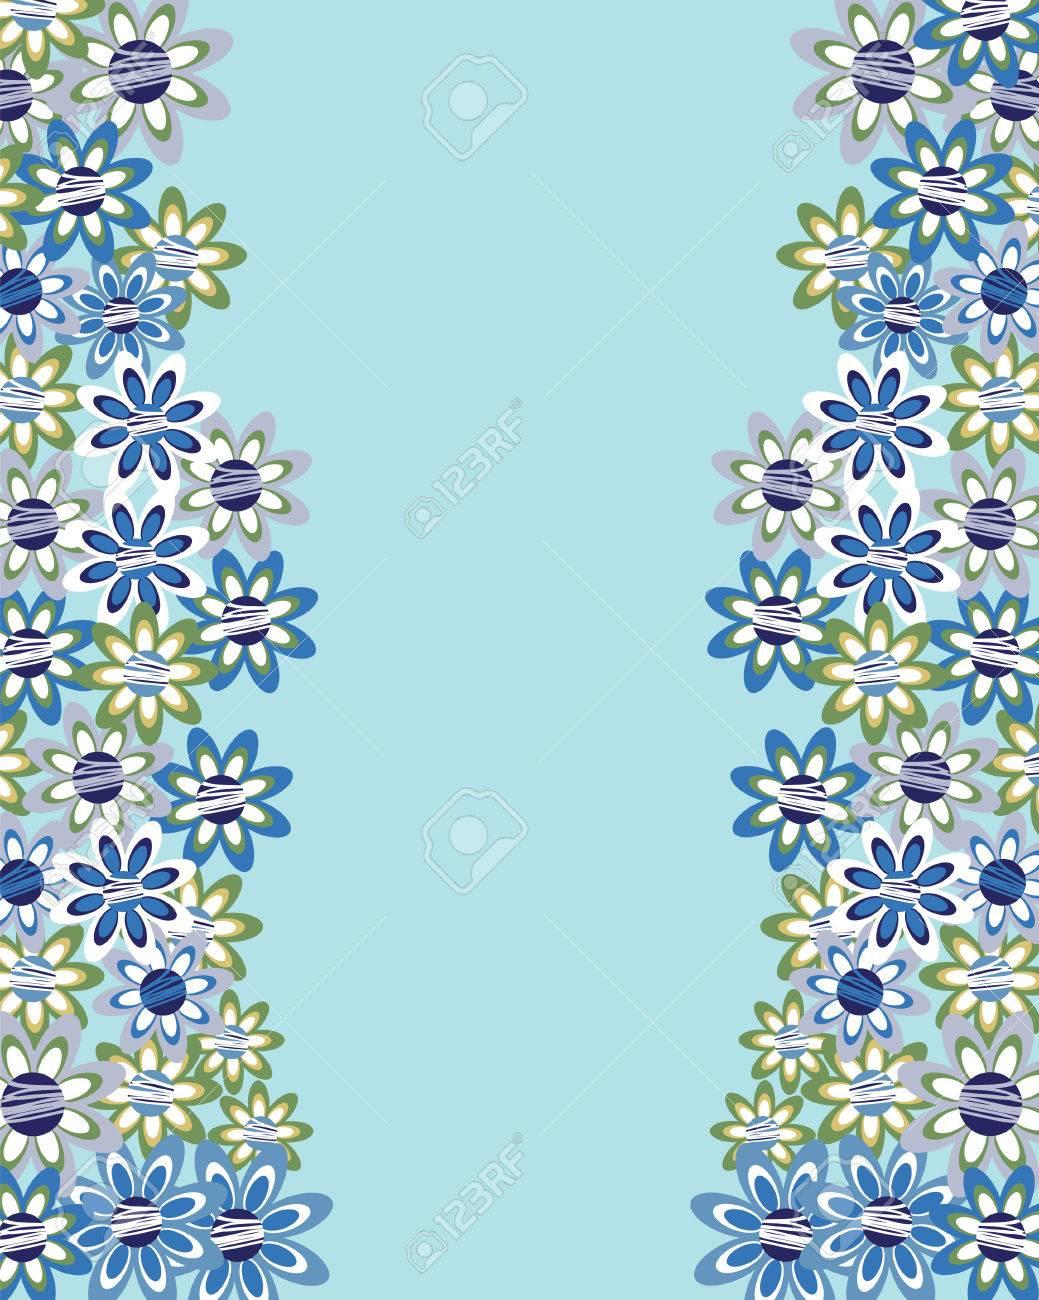 Floral Invitación O Tarjeta De Felicitación Sobre Fondo Azul. Diseño ...